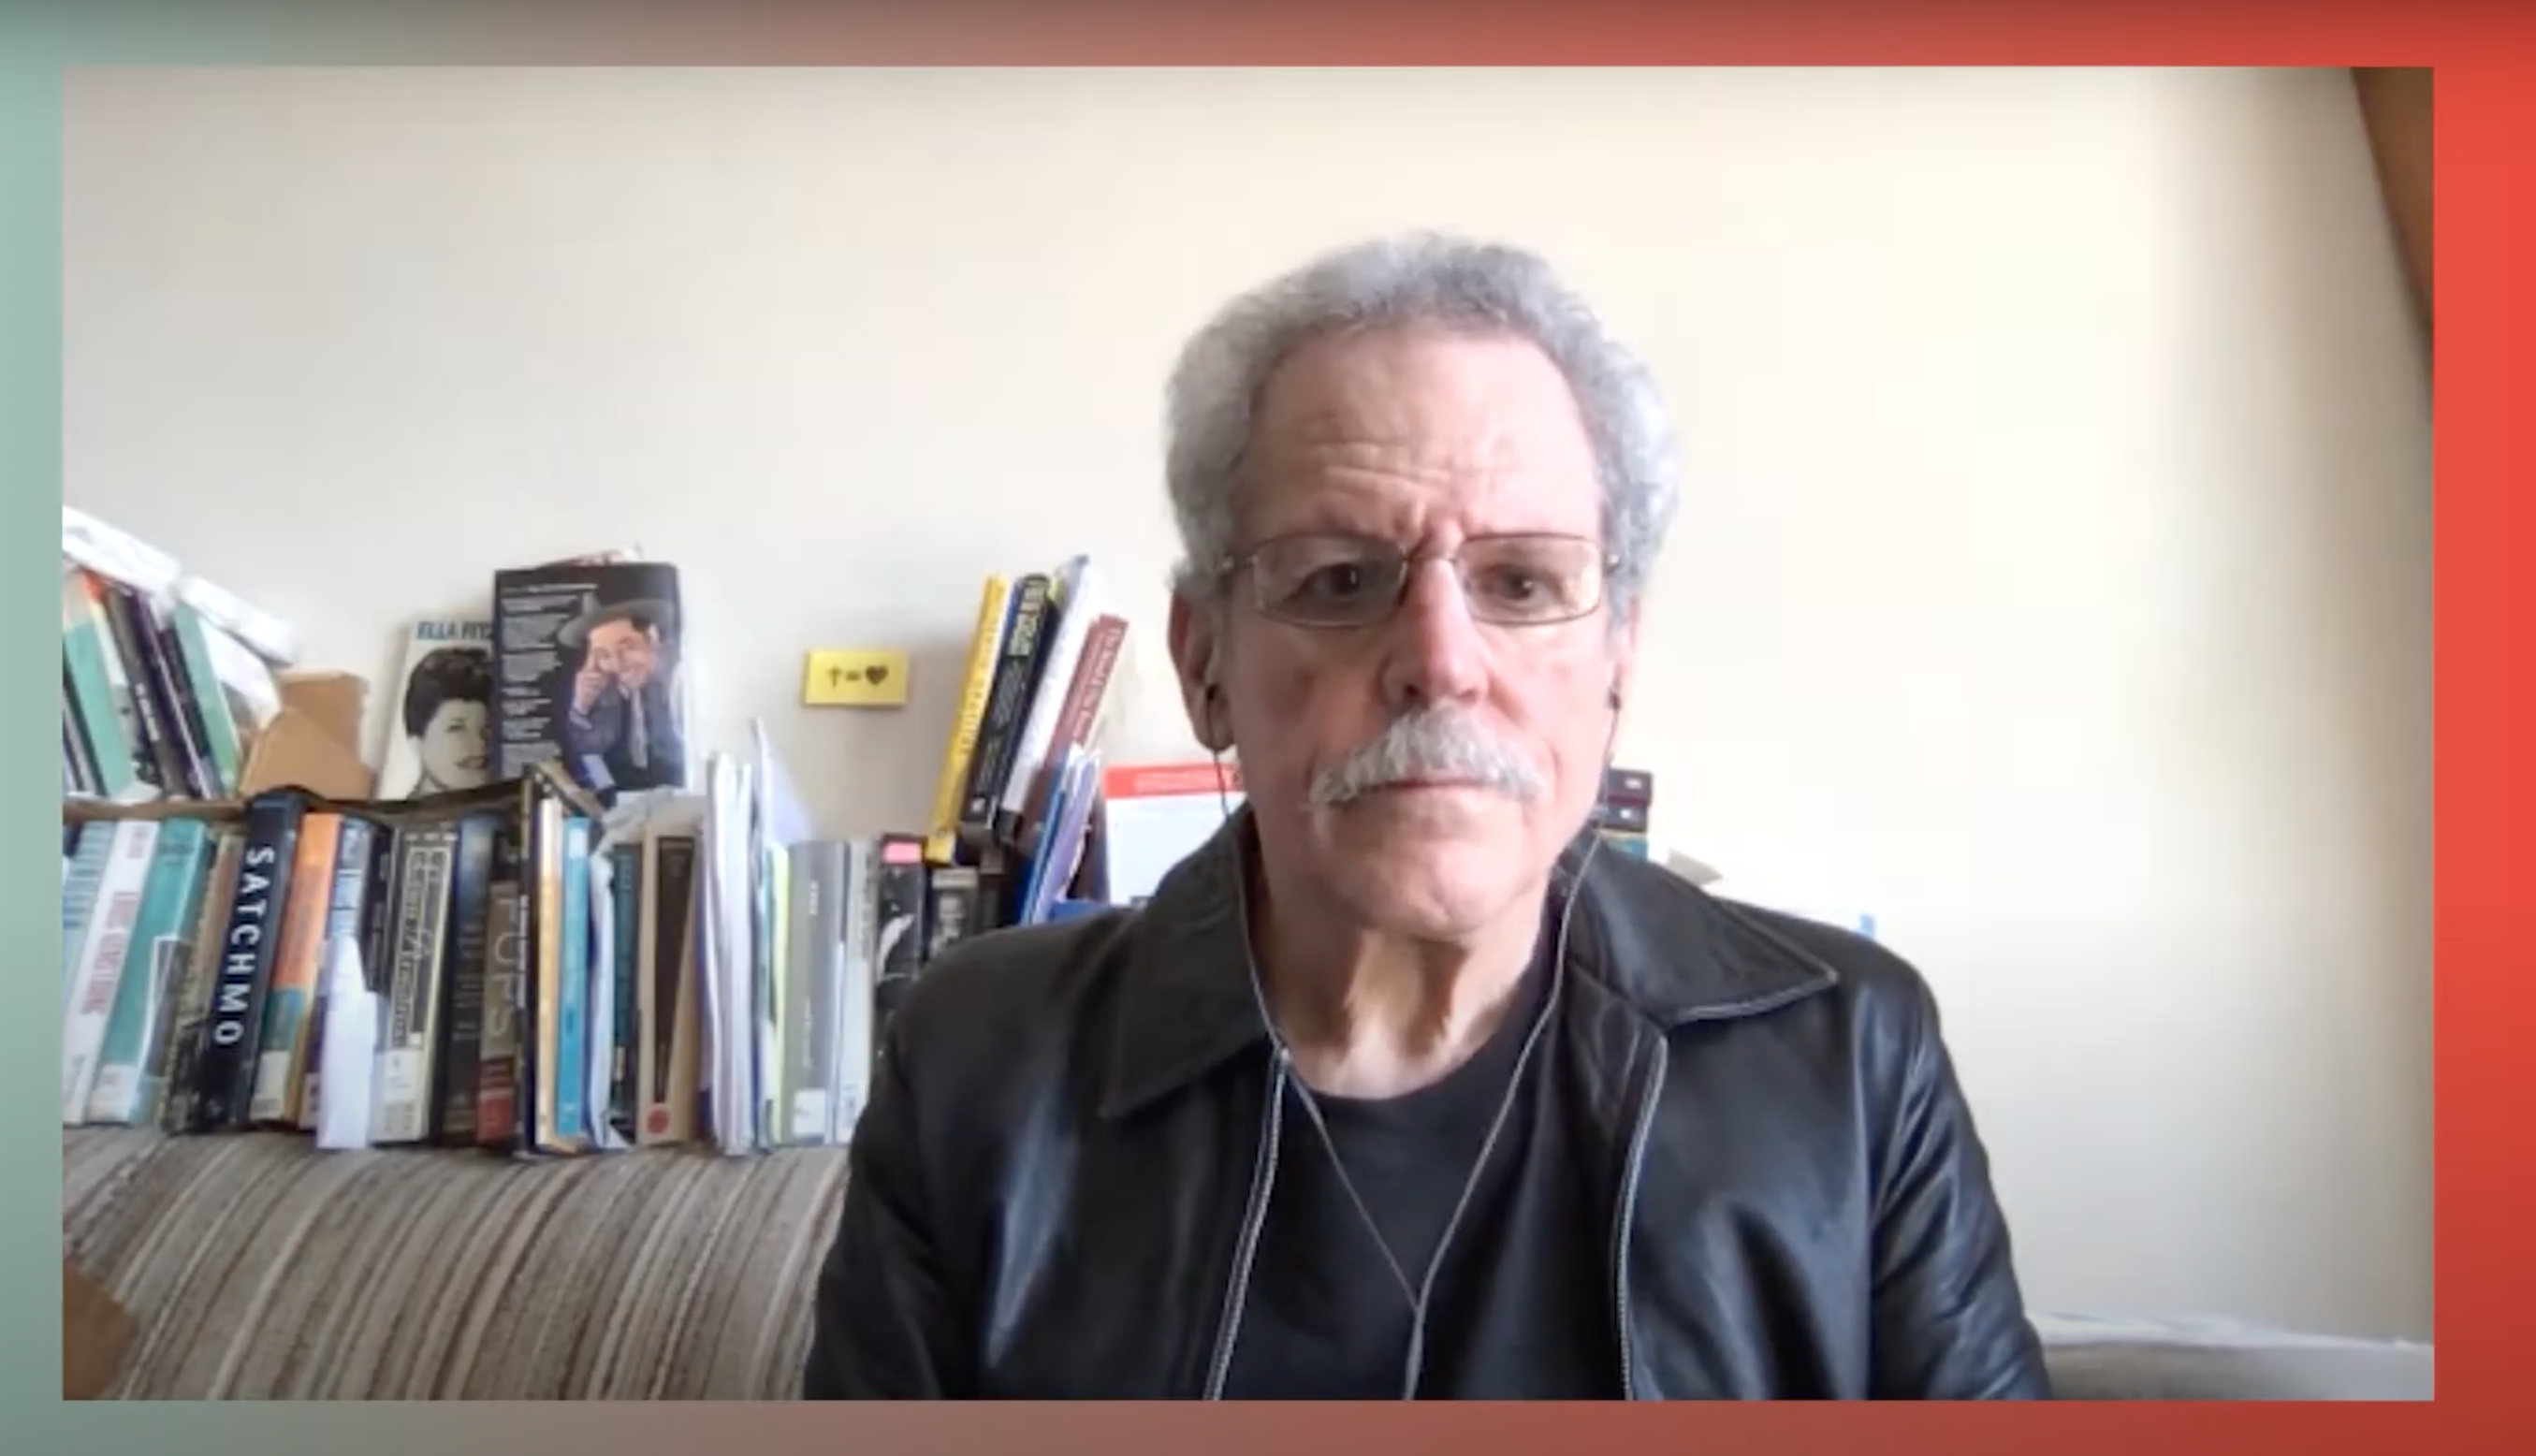 The Wise Advocate with Dr. Jeffery Schwartz